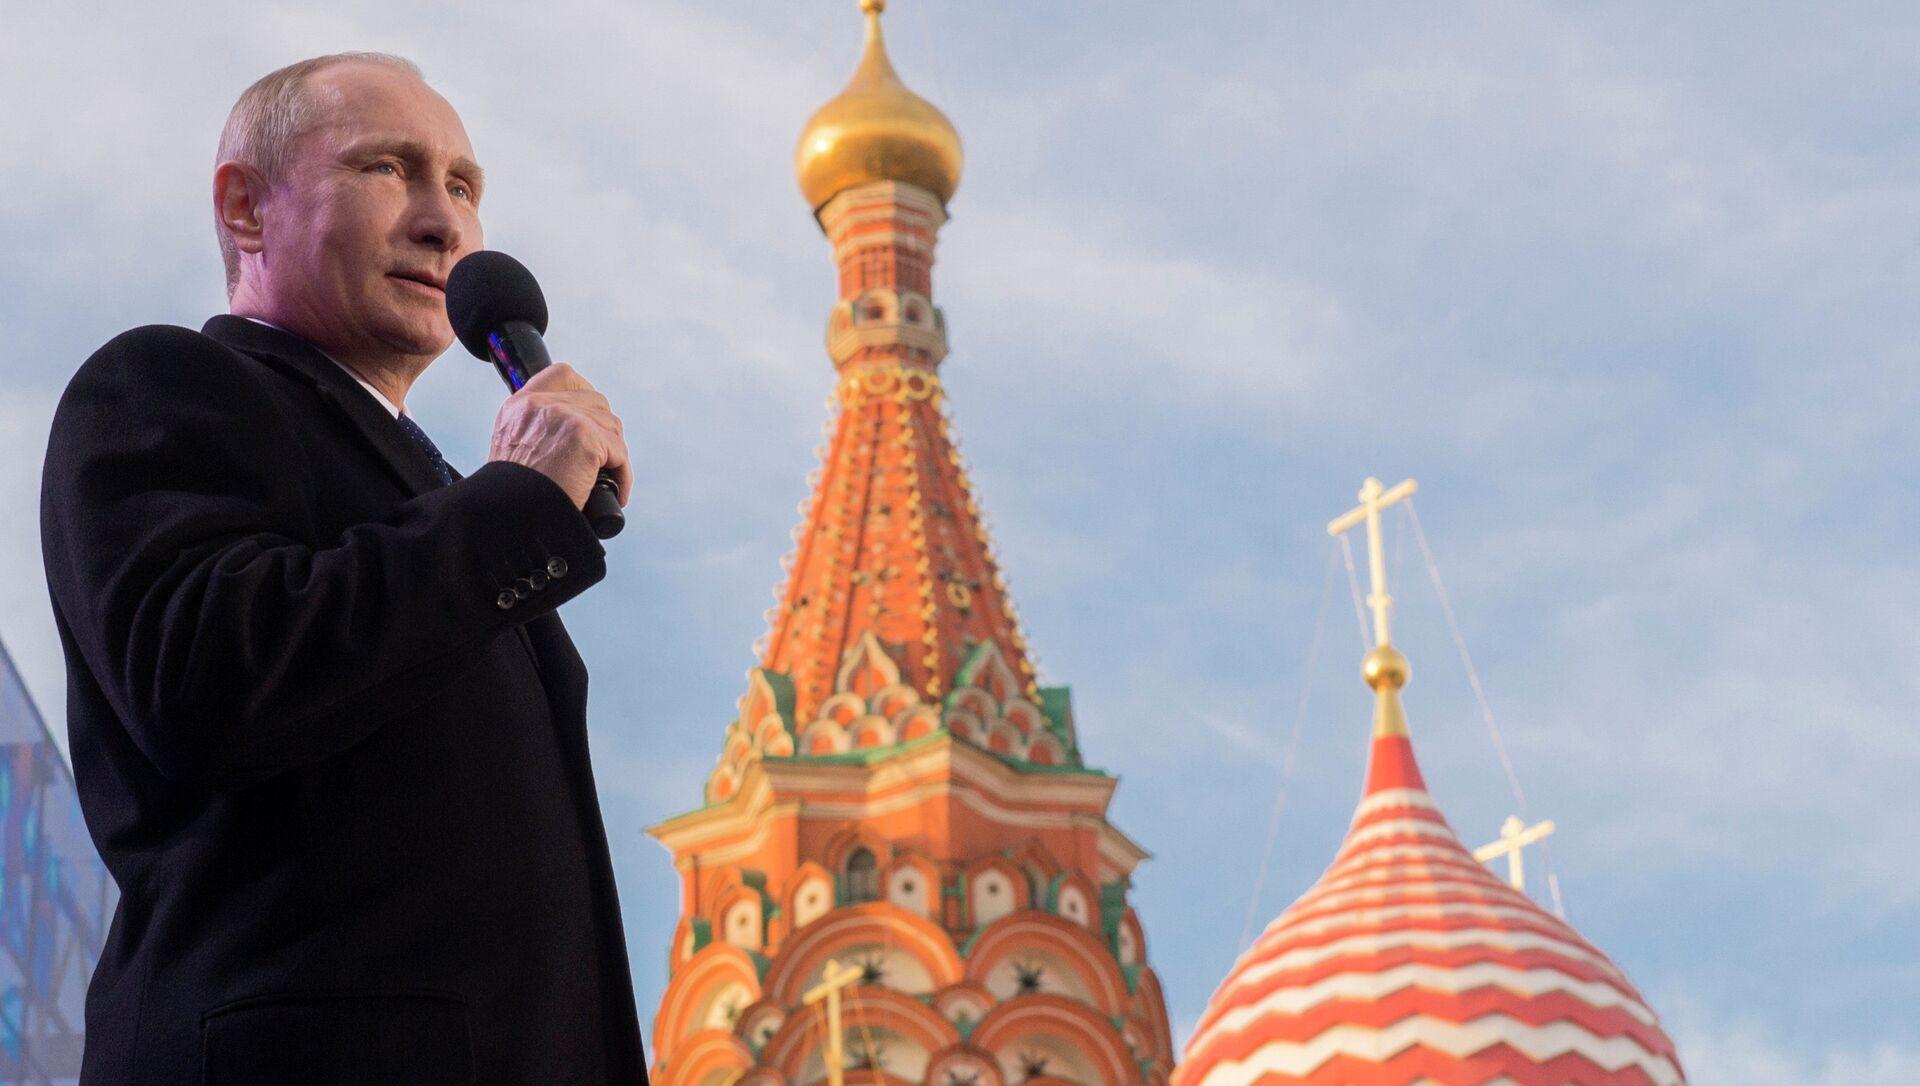 Vladimir Putin, Cremlino - Sputnik Italia, 1920, 22.04.2021